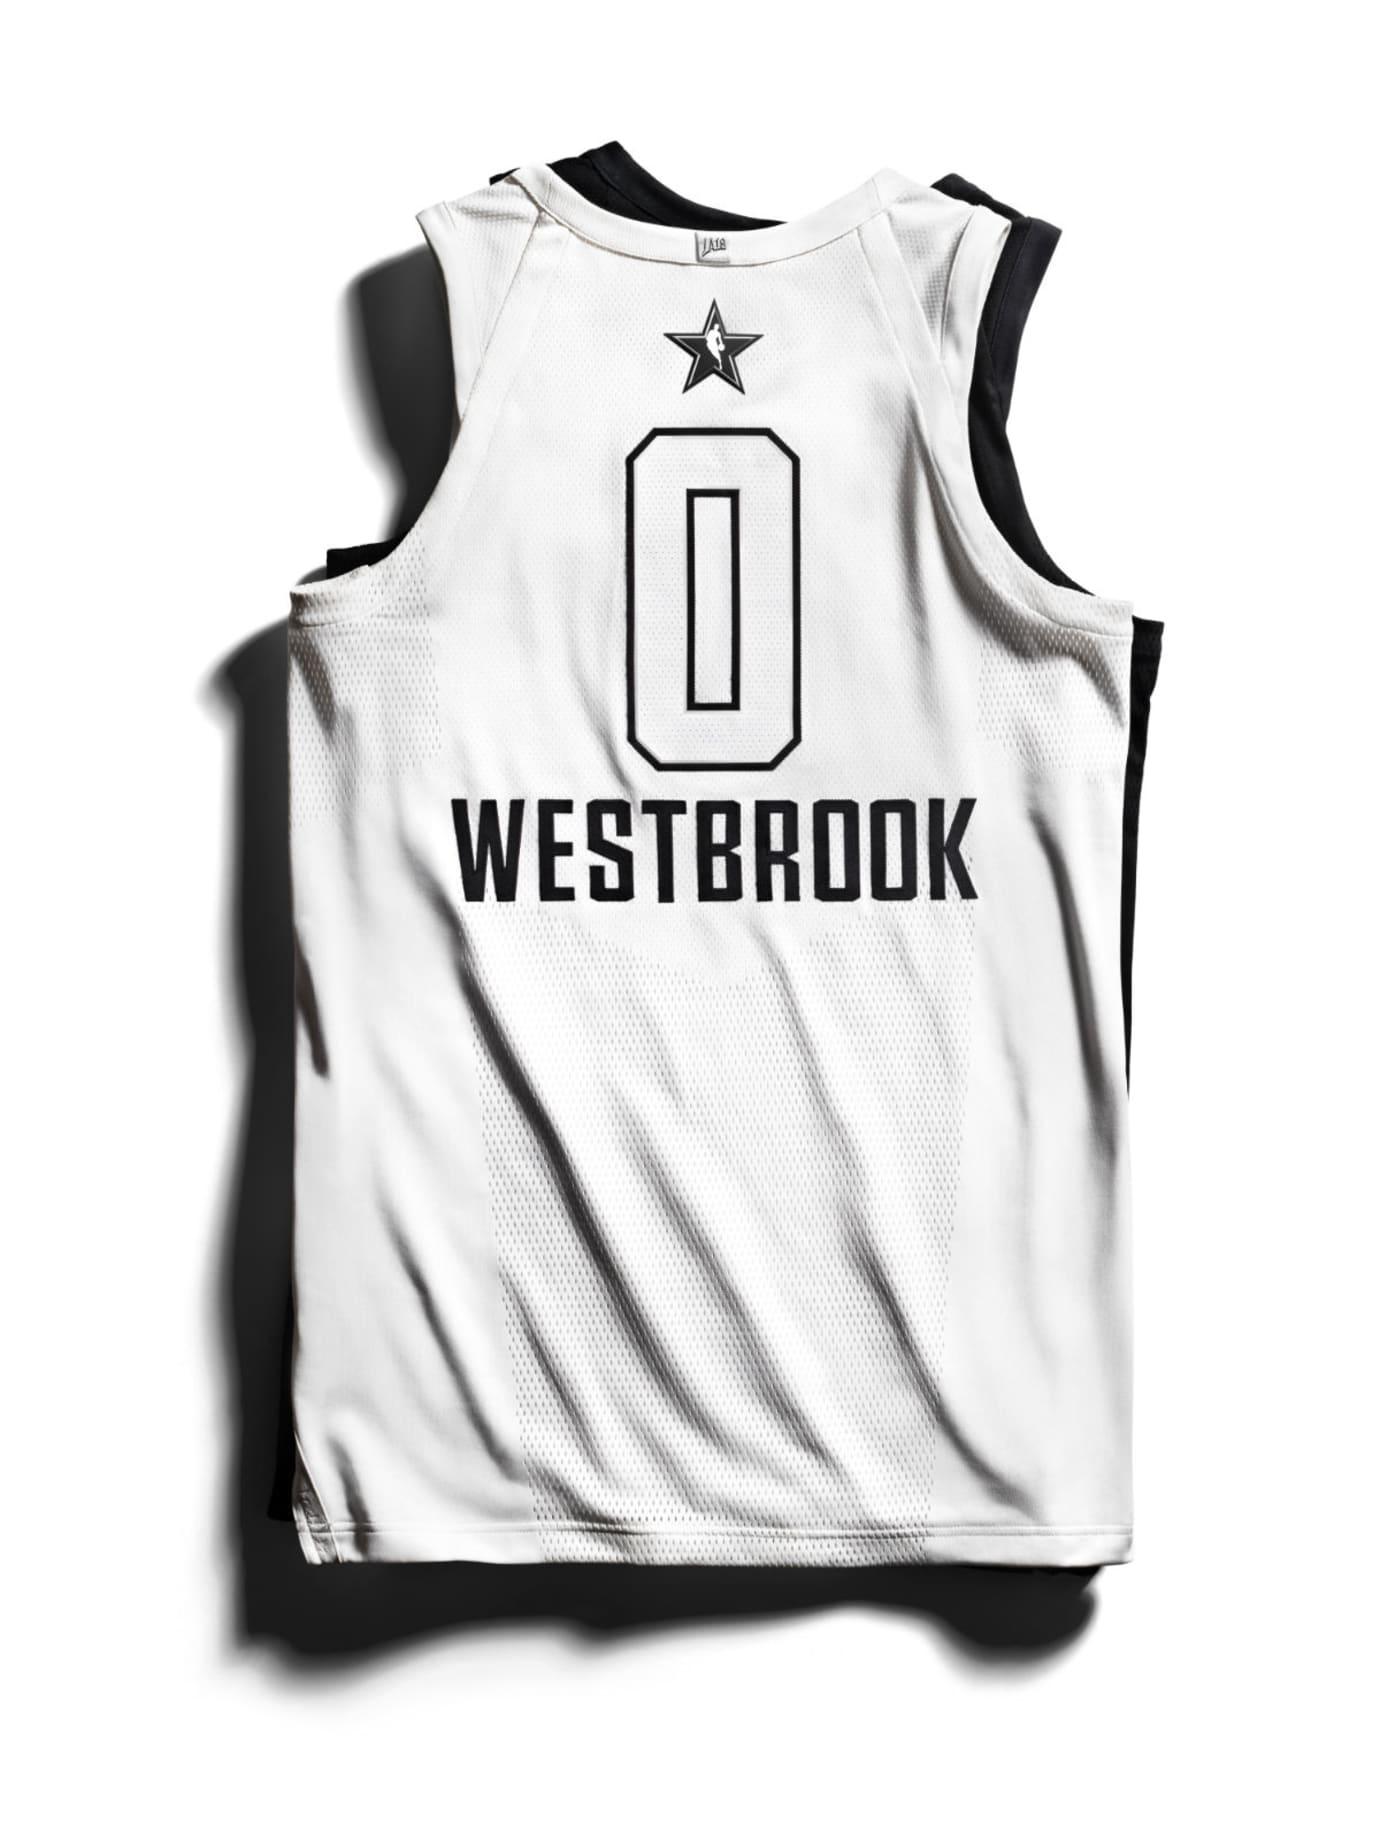 595a3b50bfd2 Jordan Brand 2018 NBA All-Star Jerseys Westbrook Back